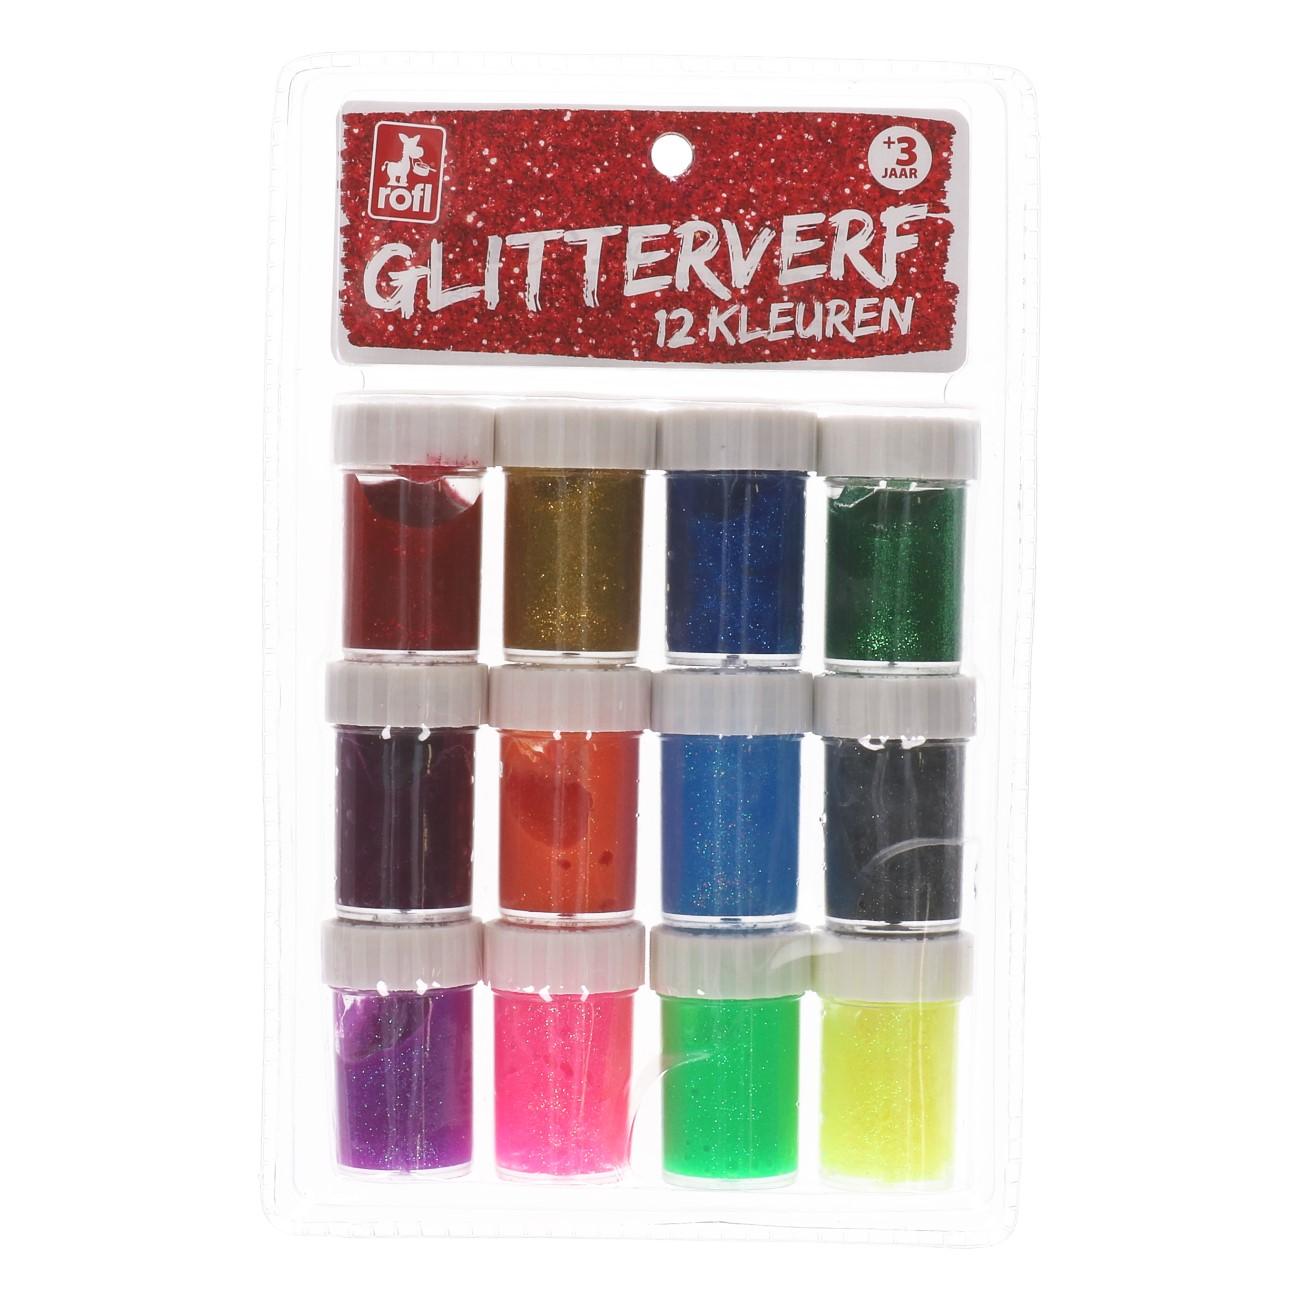 Glitterverf 12 kleuren